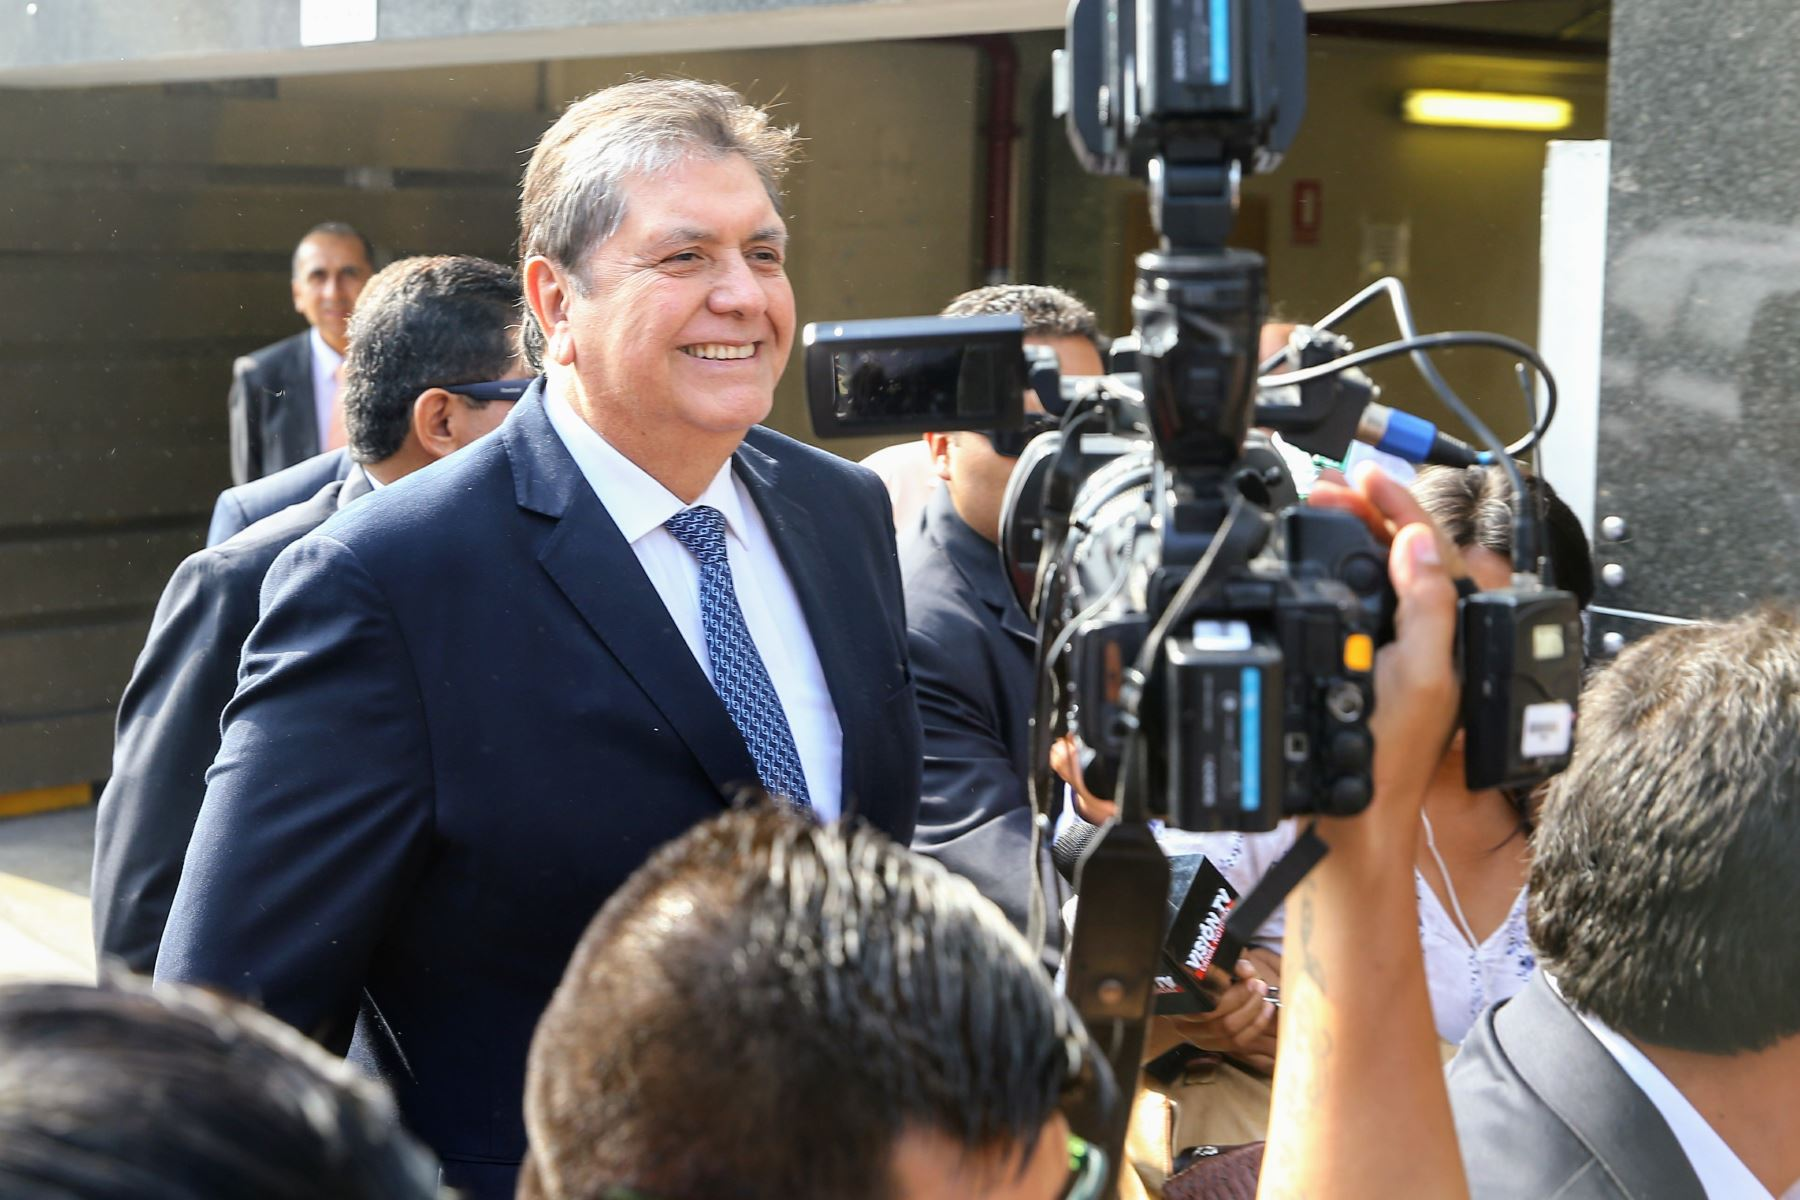 Gobierno peruano descarta intercepción telefónica ilegal a ex presidente Ala García